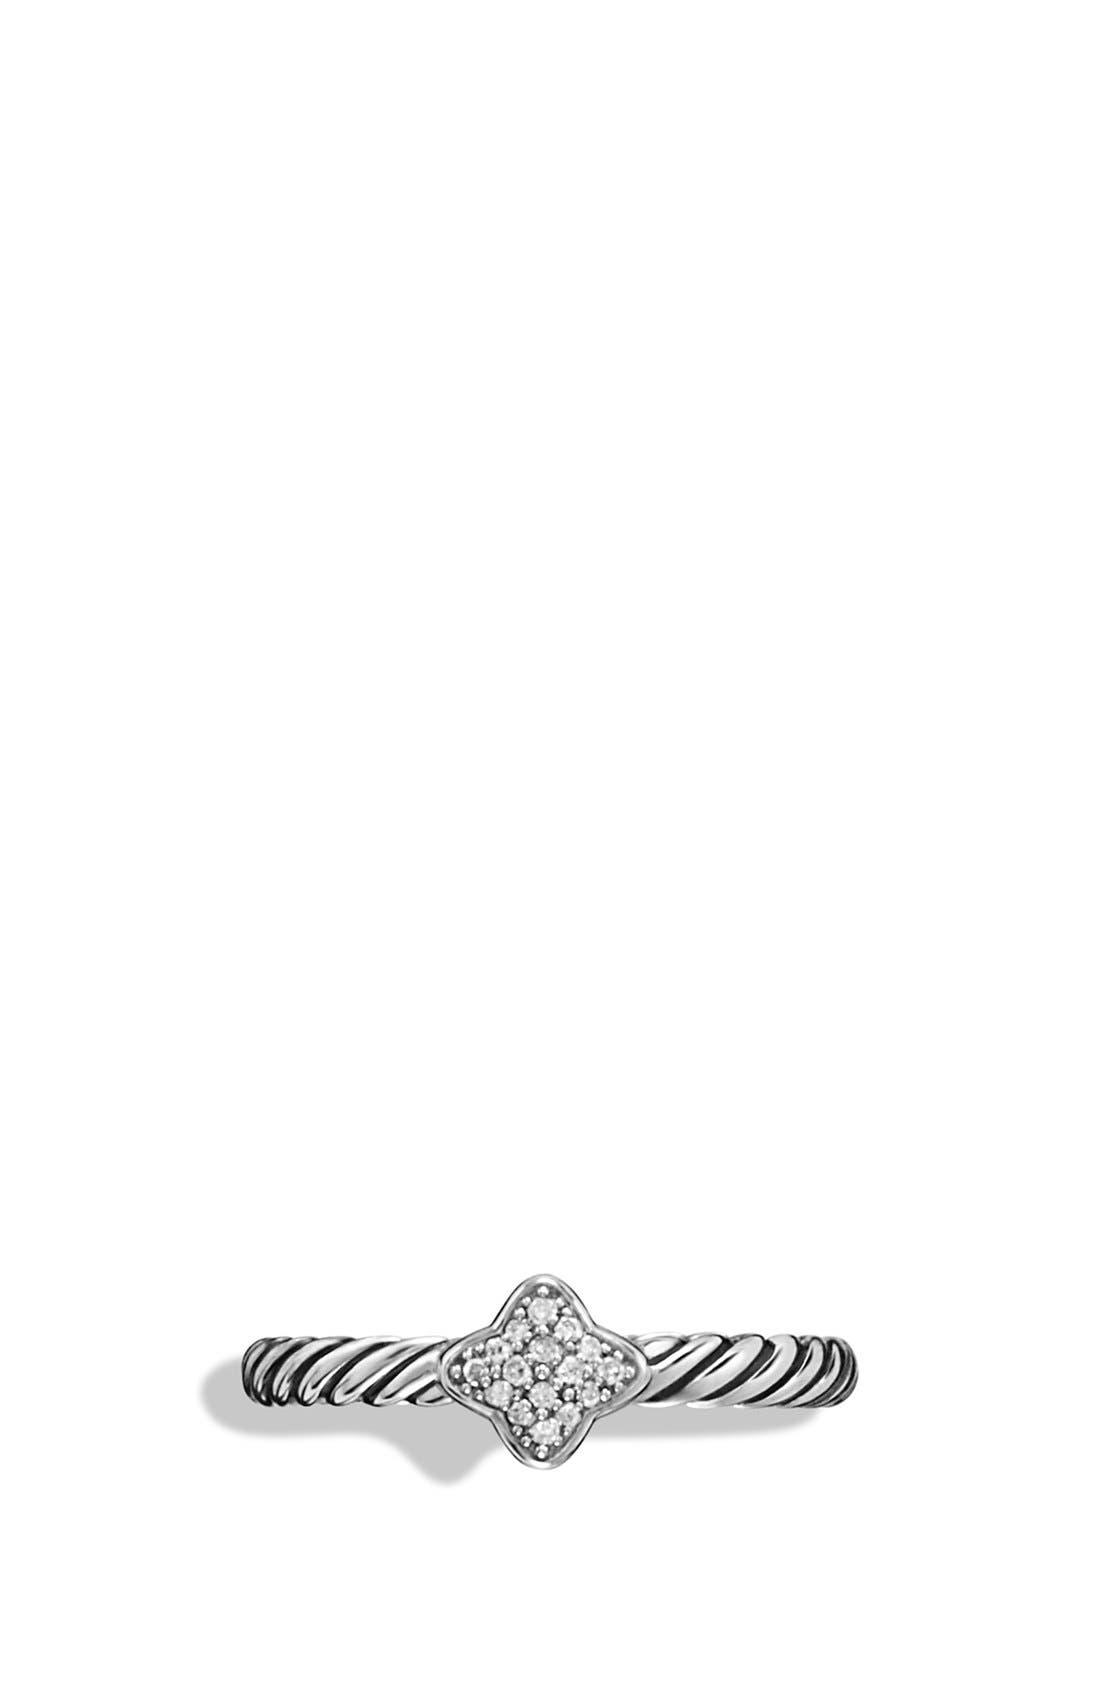 'Cable Collectibles - Quatrefoil' Ring with Diamonds,                             Alternate thumbnail 2, color,                             DIAMOND